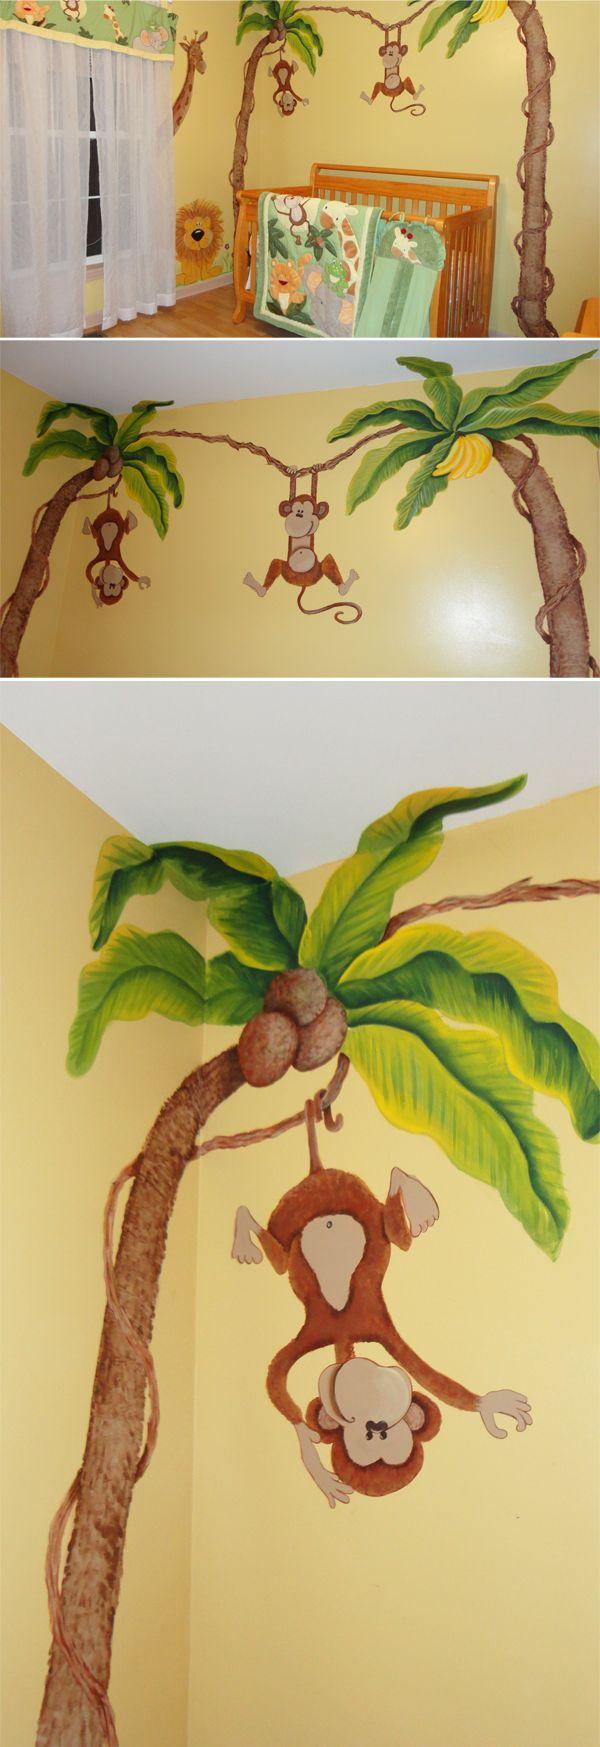 Jungle themed nursery1 baby thoughts pinterest - Piratenzimmer wandgestaltung ...